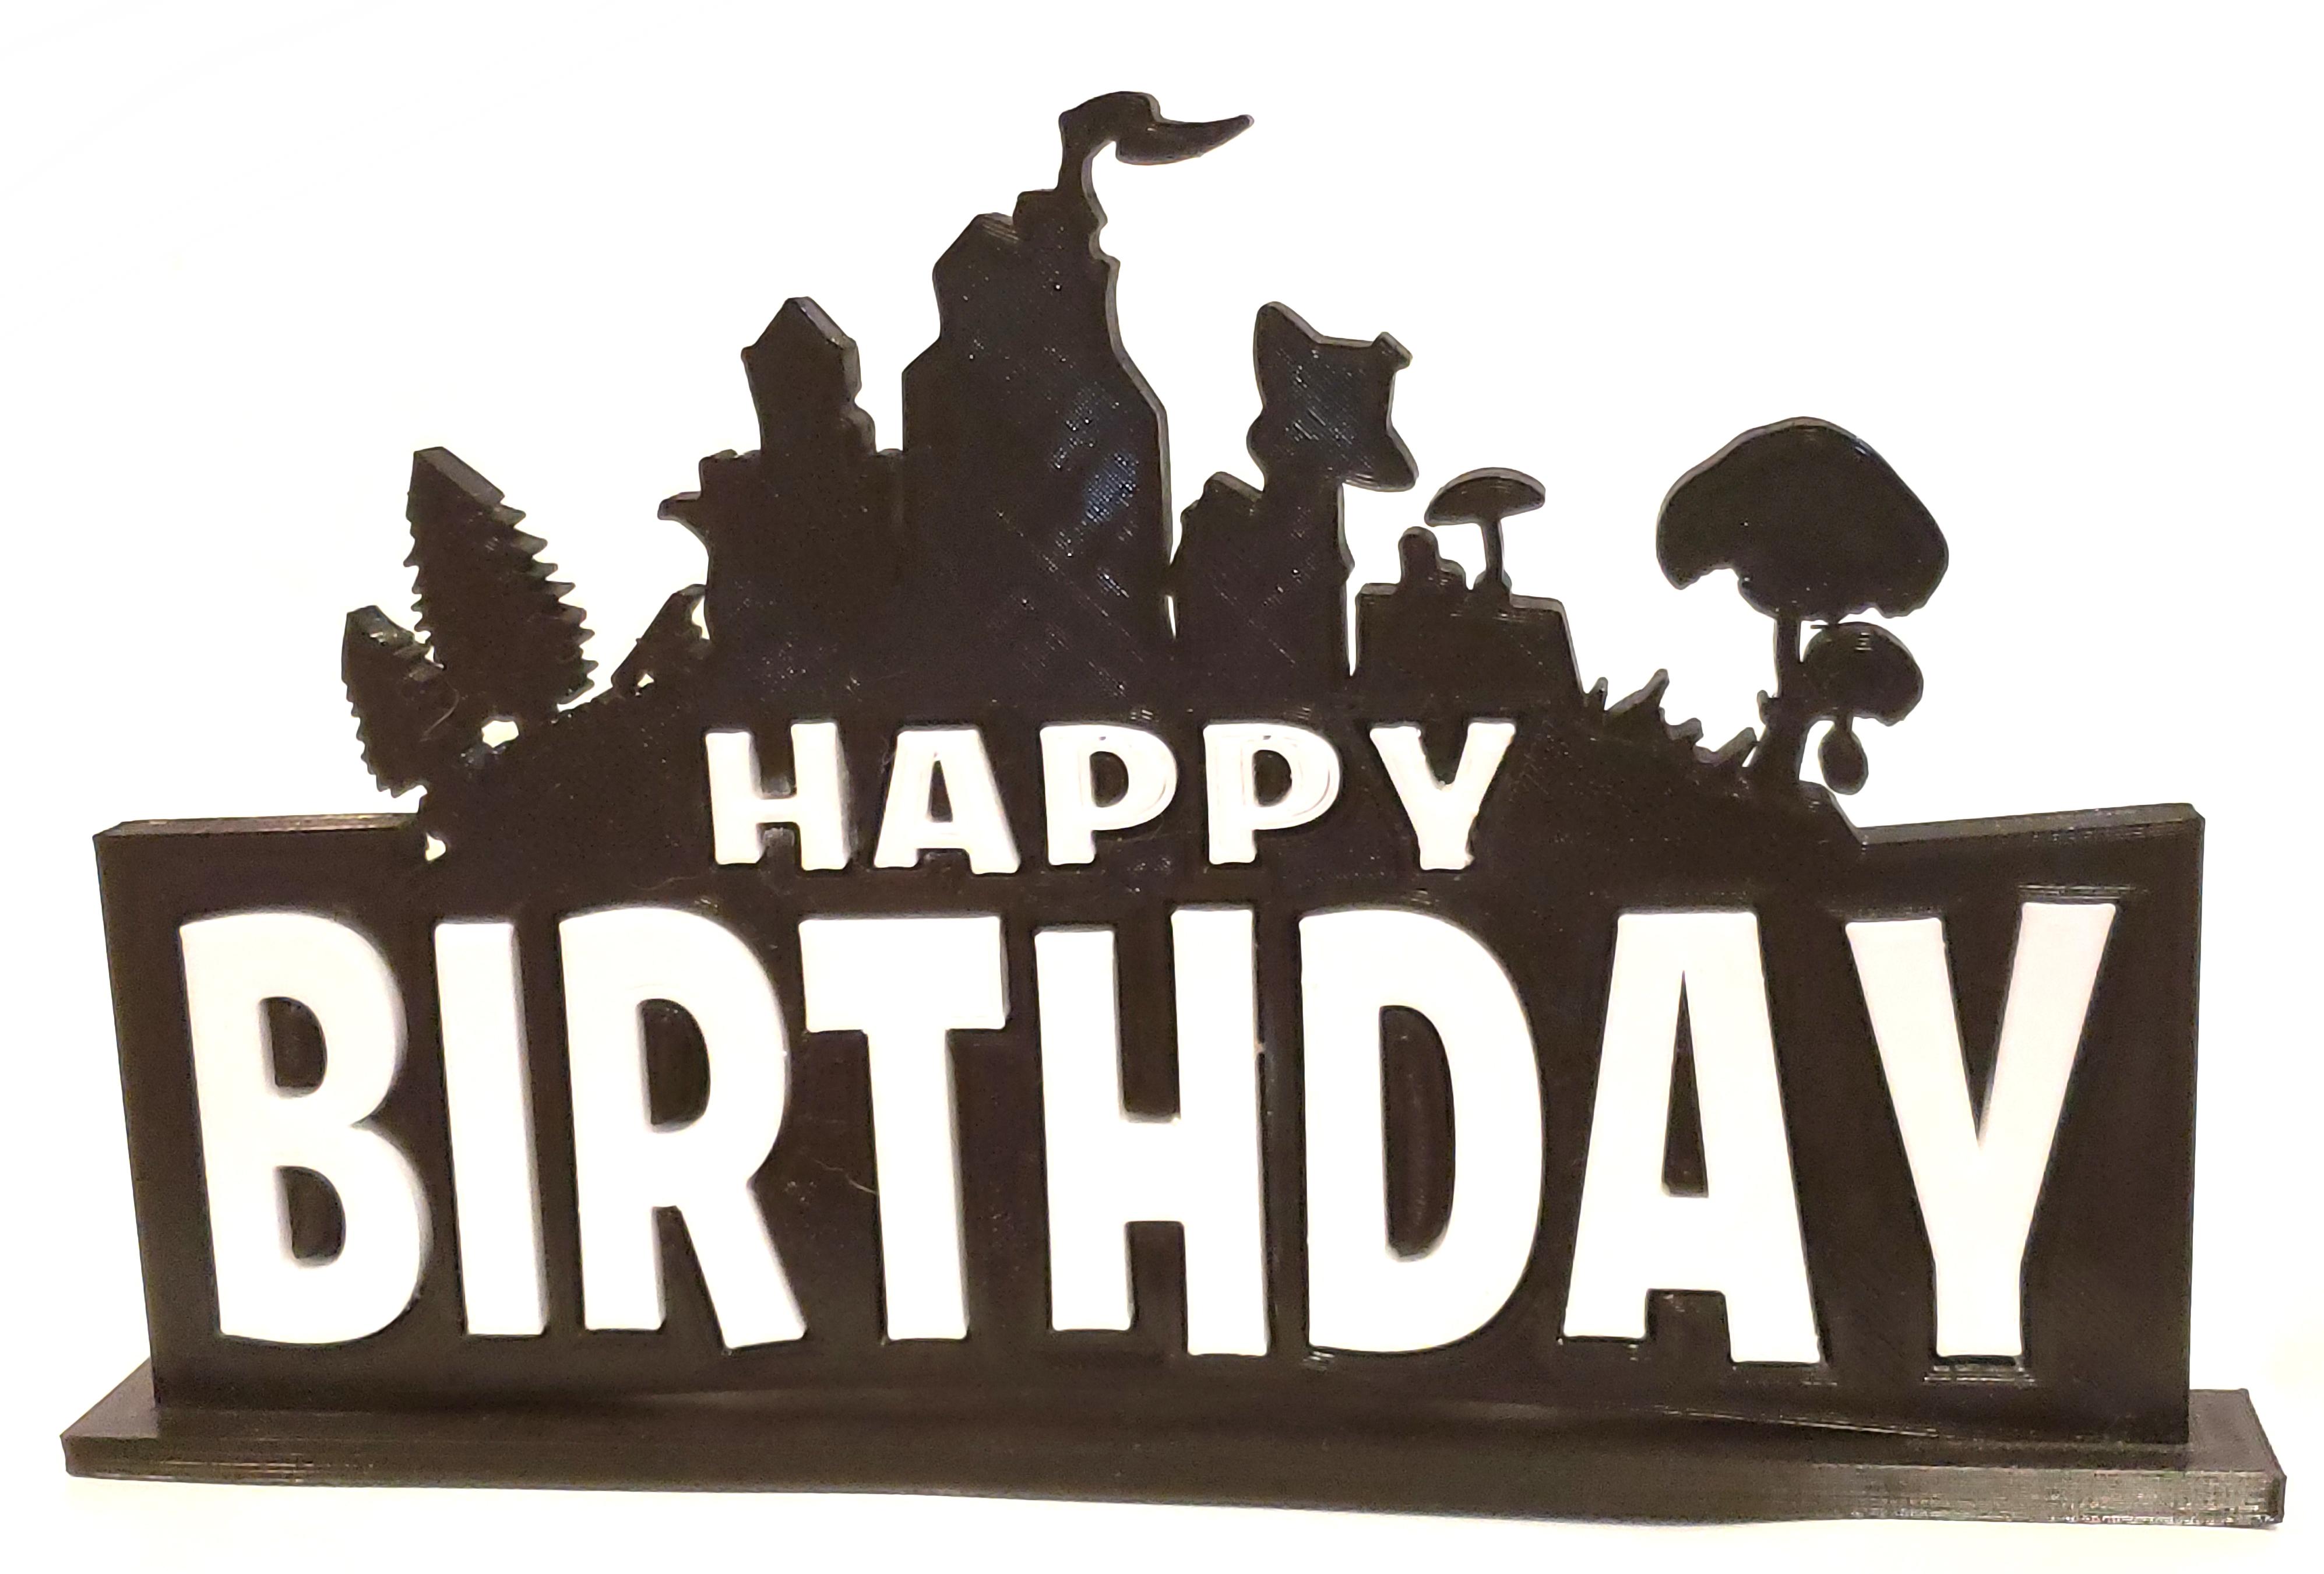 2 color fortnite themed happy birthday cake topper or stand alone - fortnite happy birthday pictures